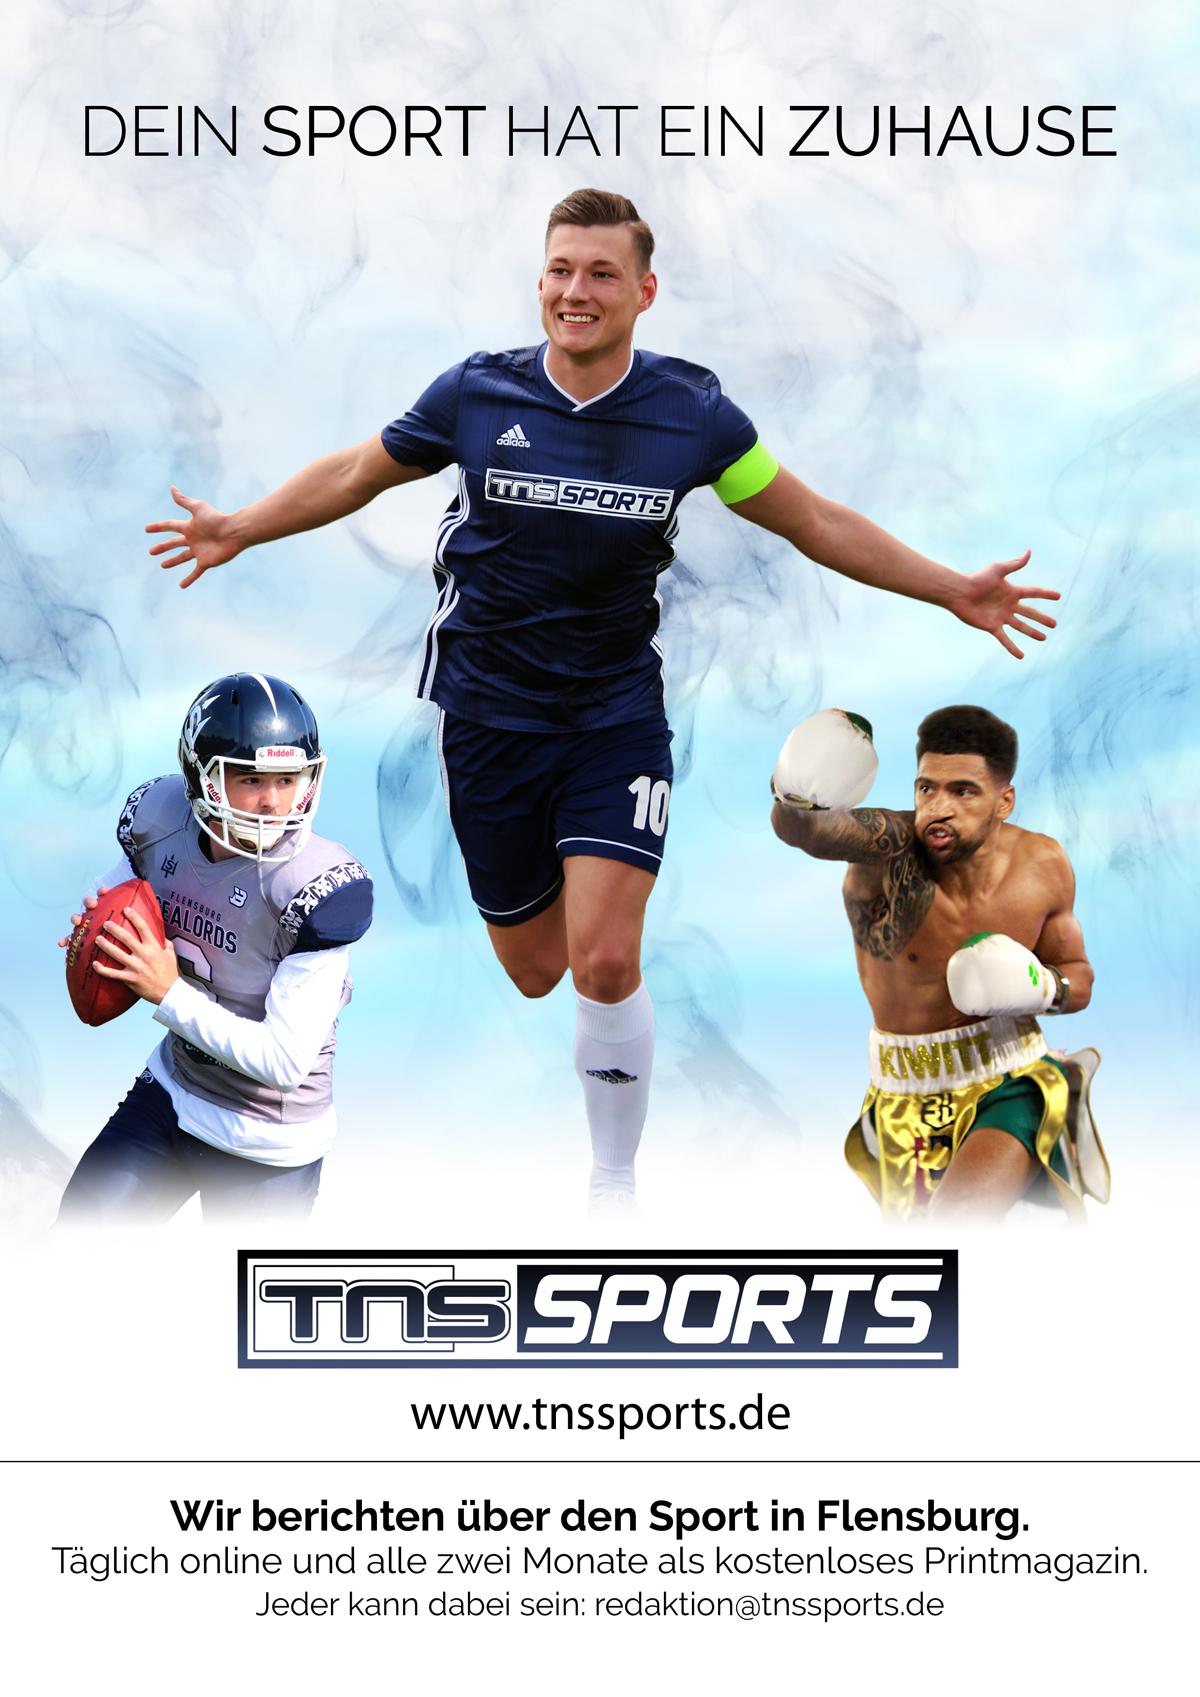 TNS Sports Poster 2020